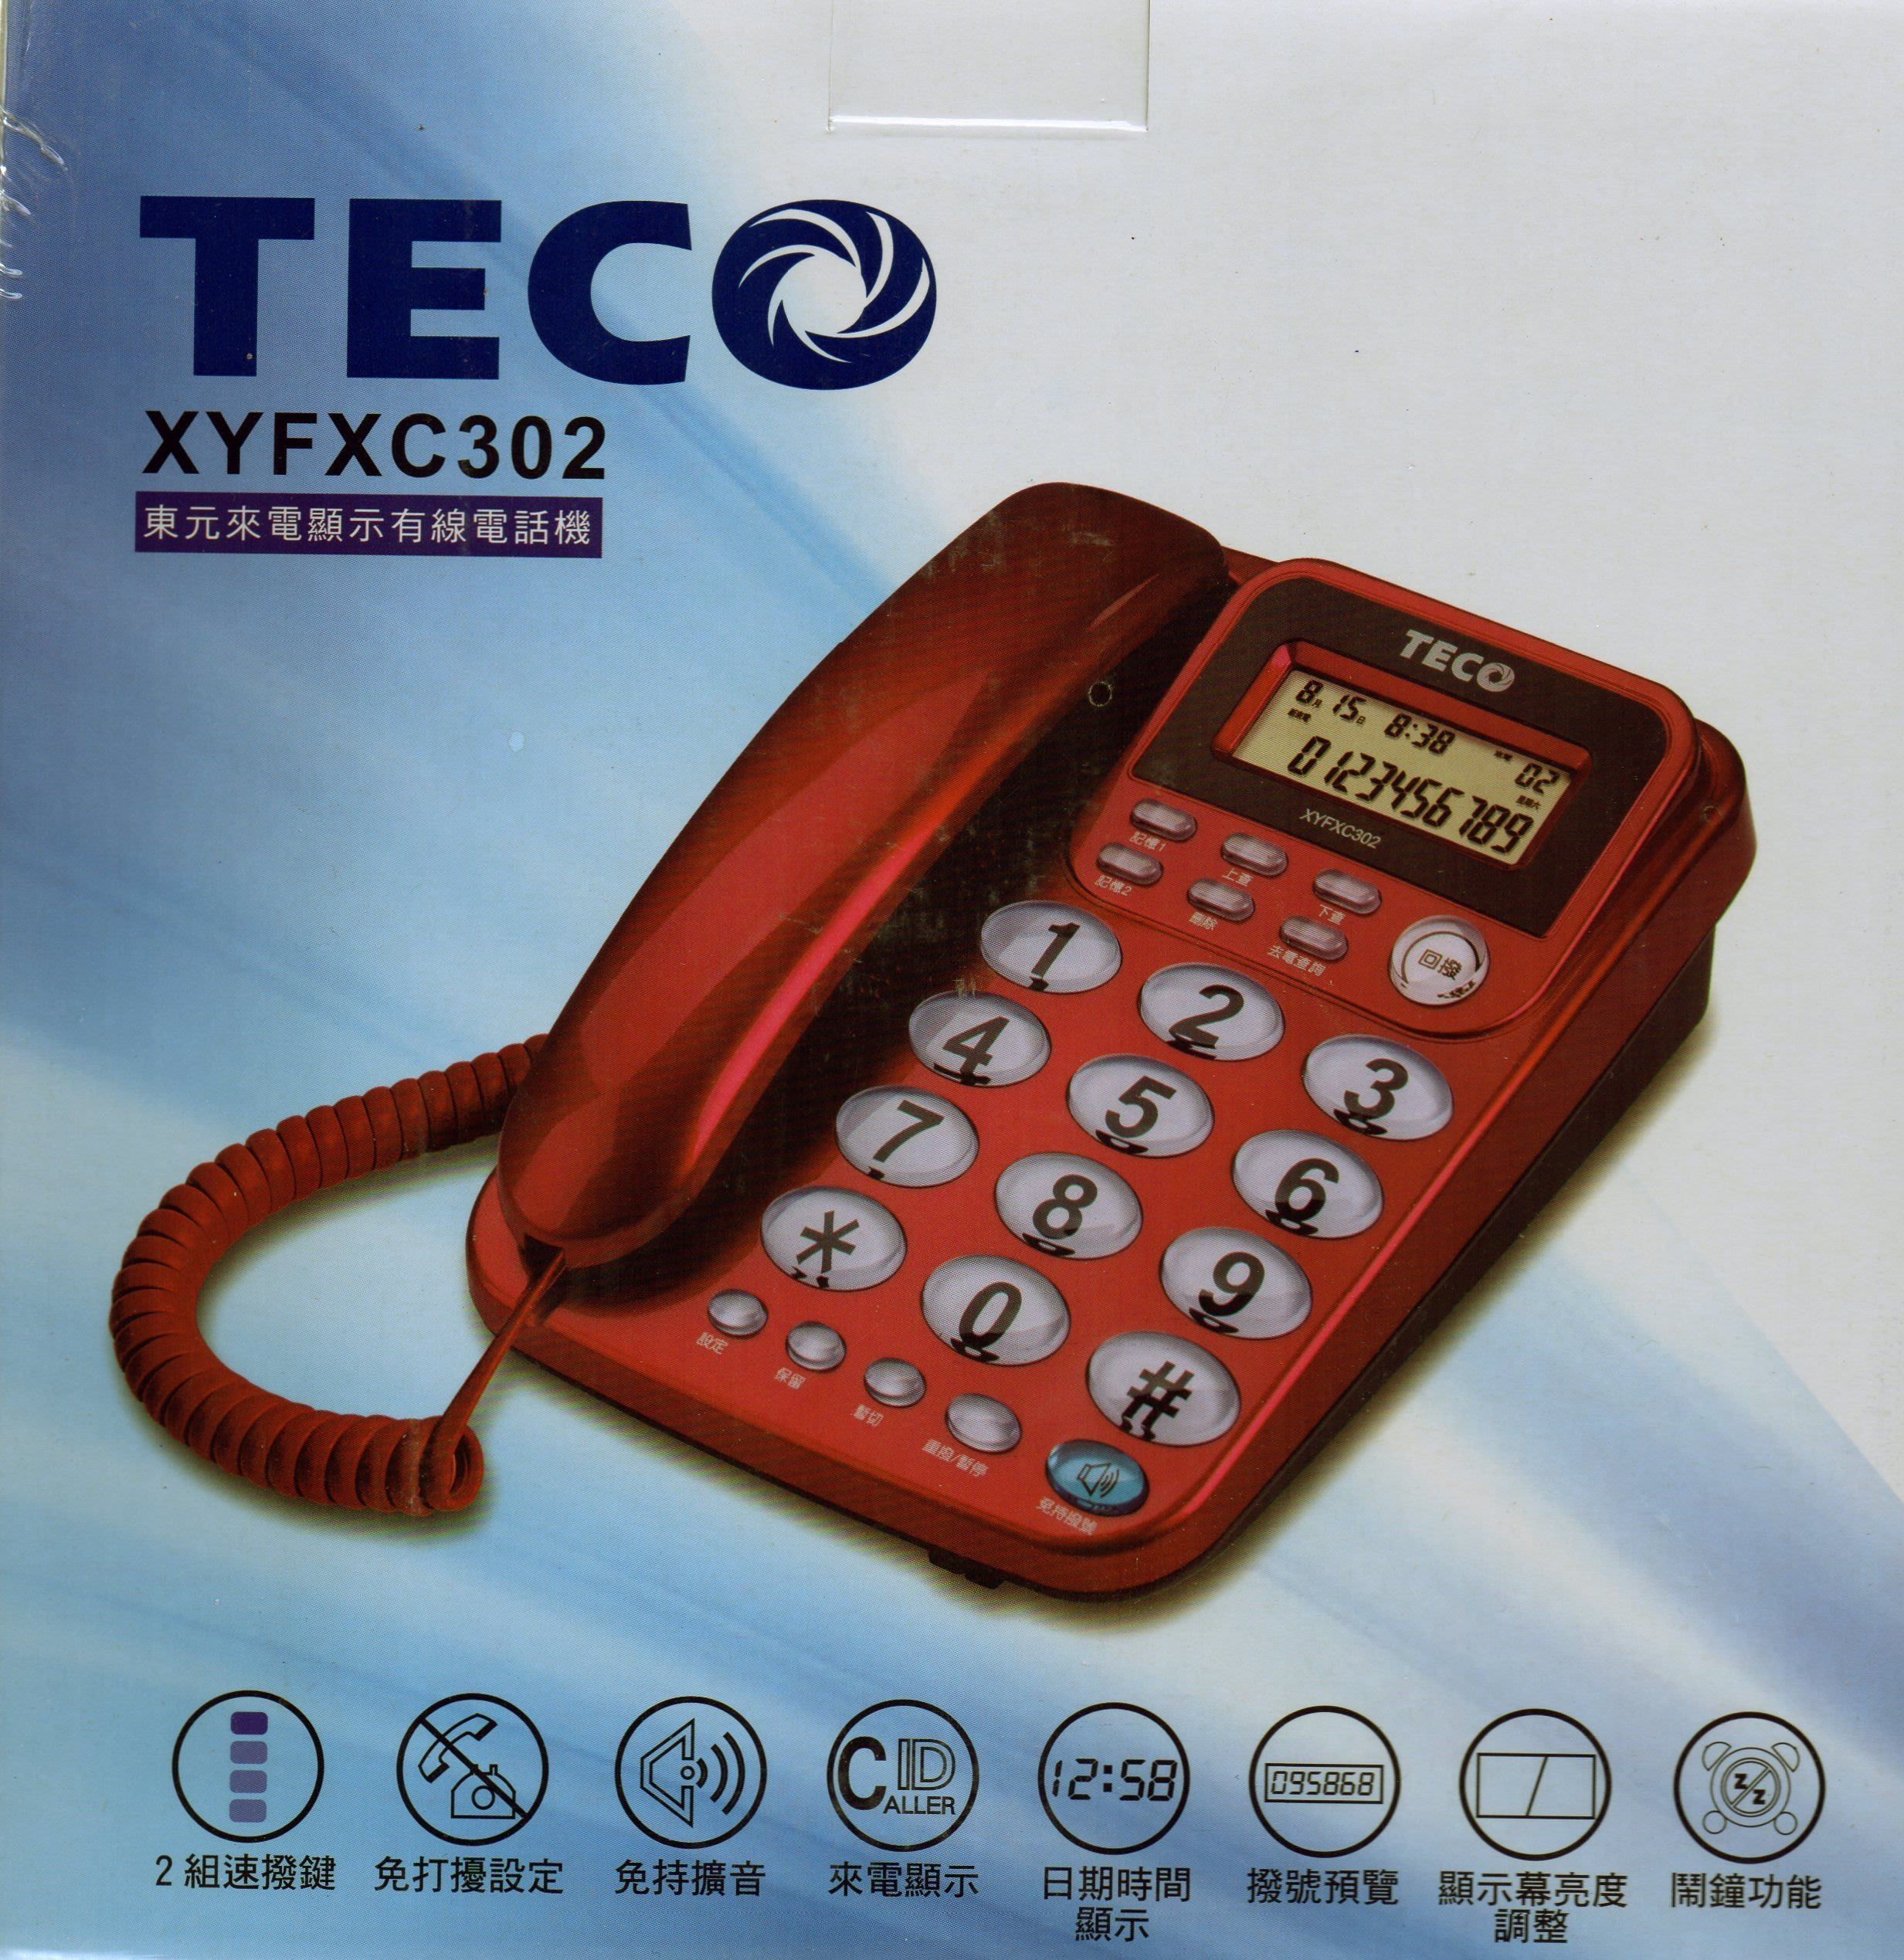 【NICE-達人】【多件優惠】 TECO 東元XYFXC302來電顯示有線電話具2組單鍵速撥_紅色款/銀色款可選